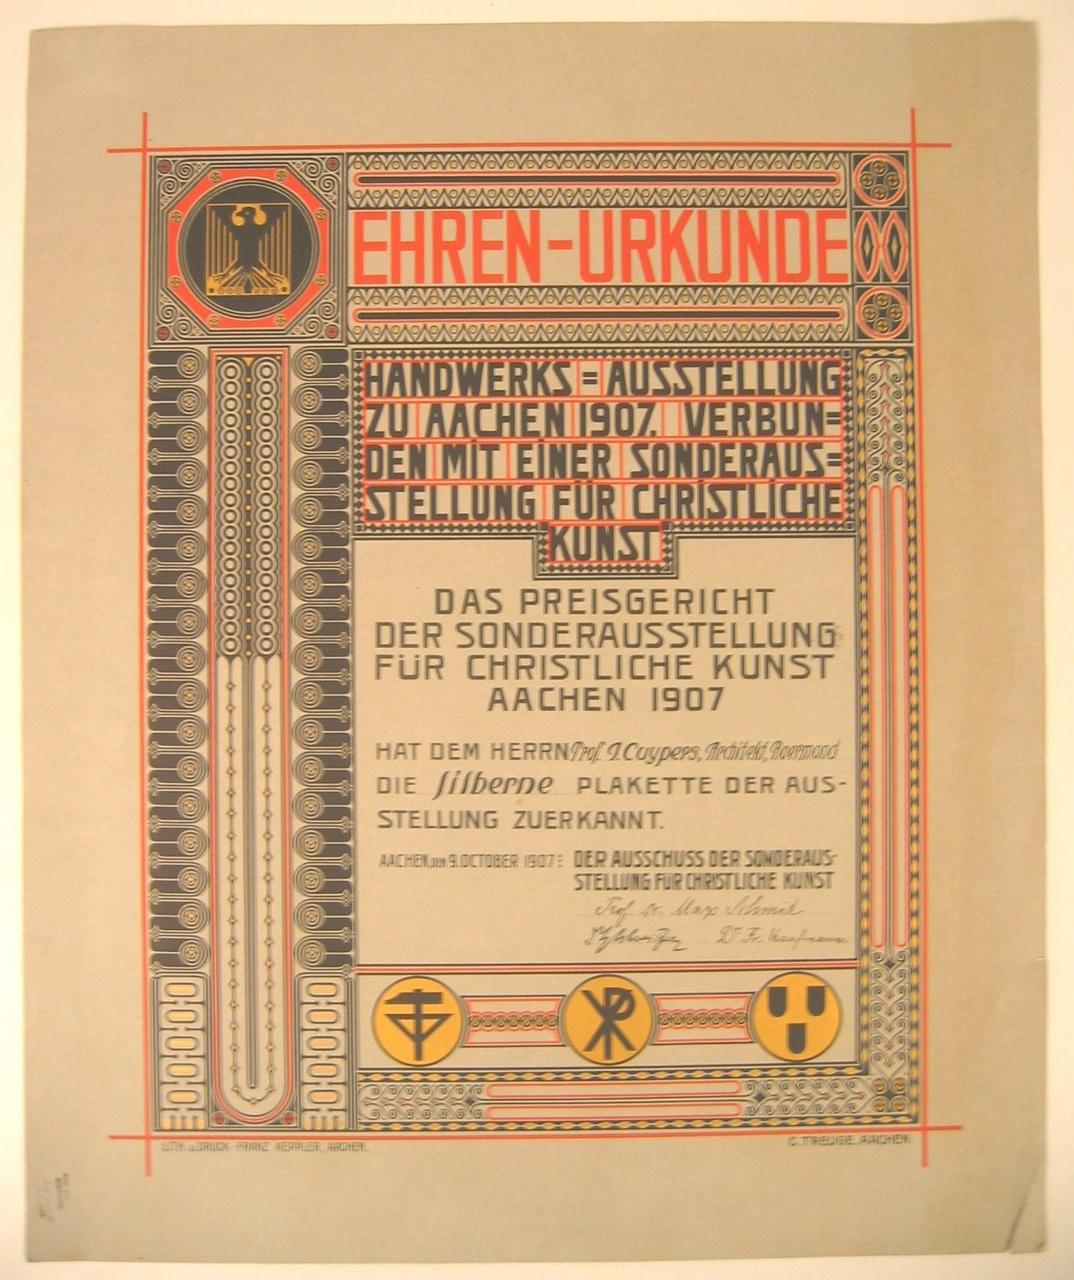 Oorkonde voor de 'silberne plakette' tijdens de 'Handwerks-Ausstellung zu Aachen 1907'